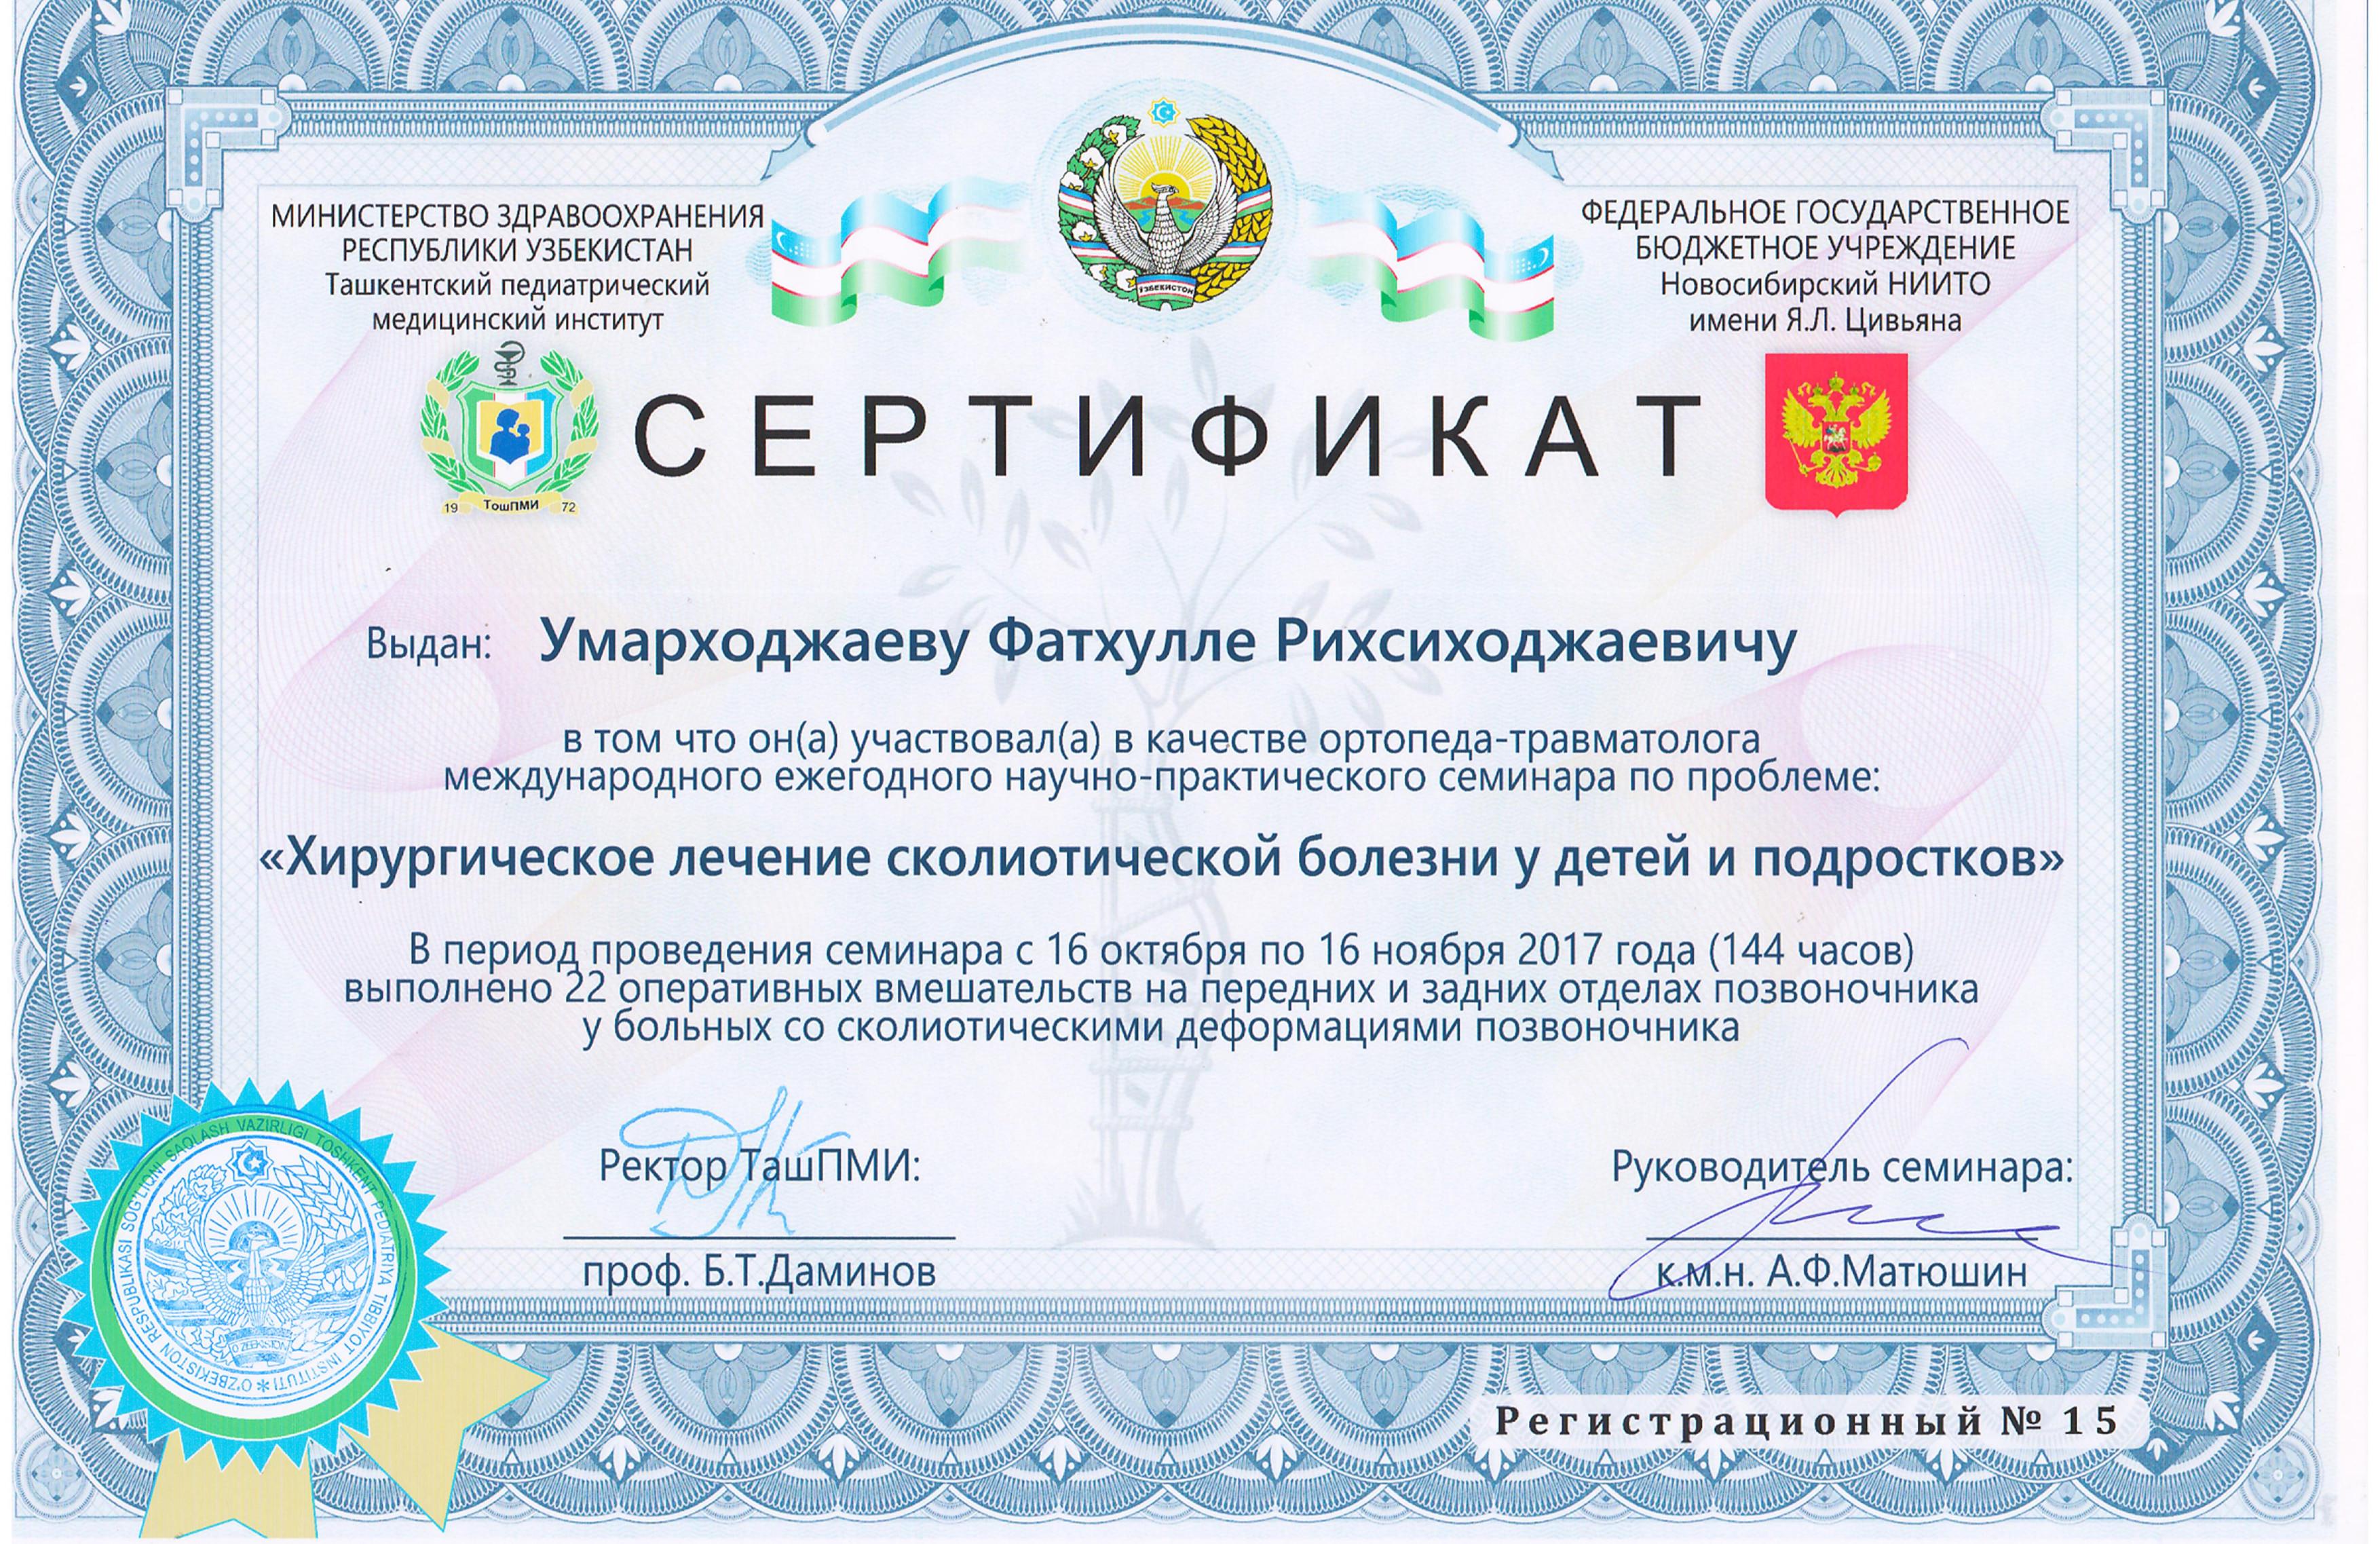 Сертификат Ортопед (pdf.io)